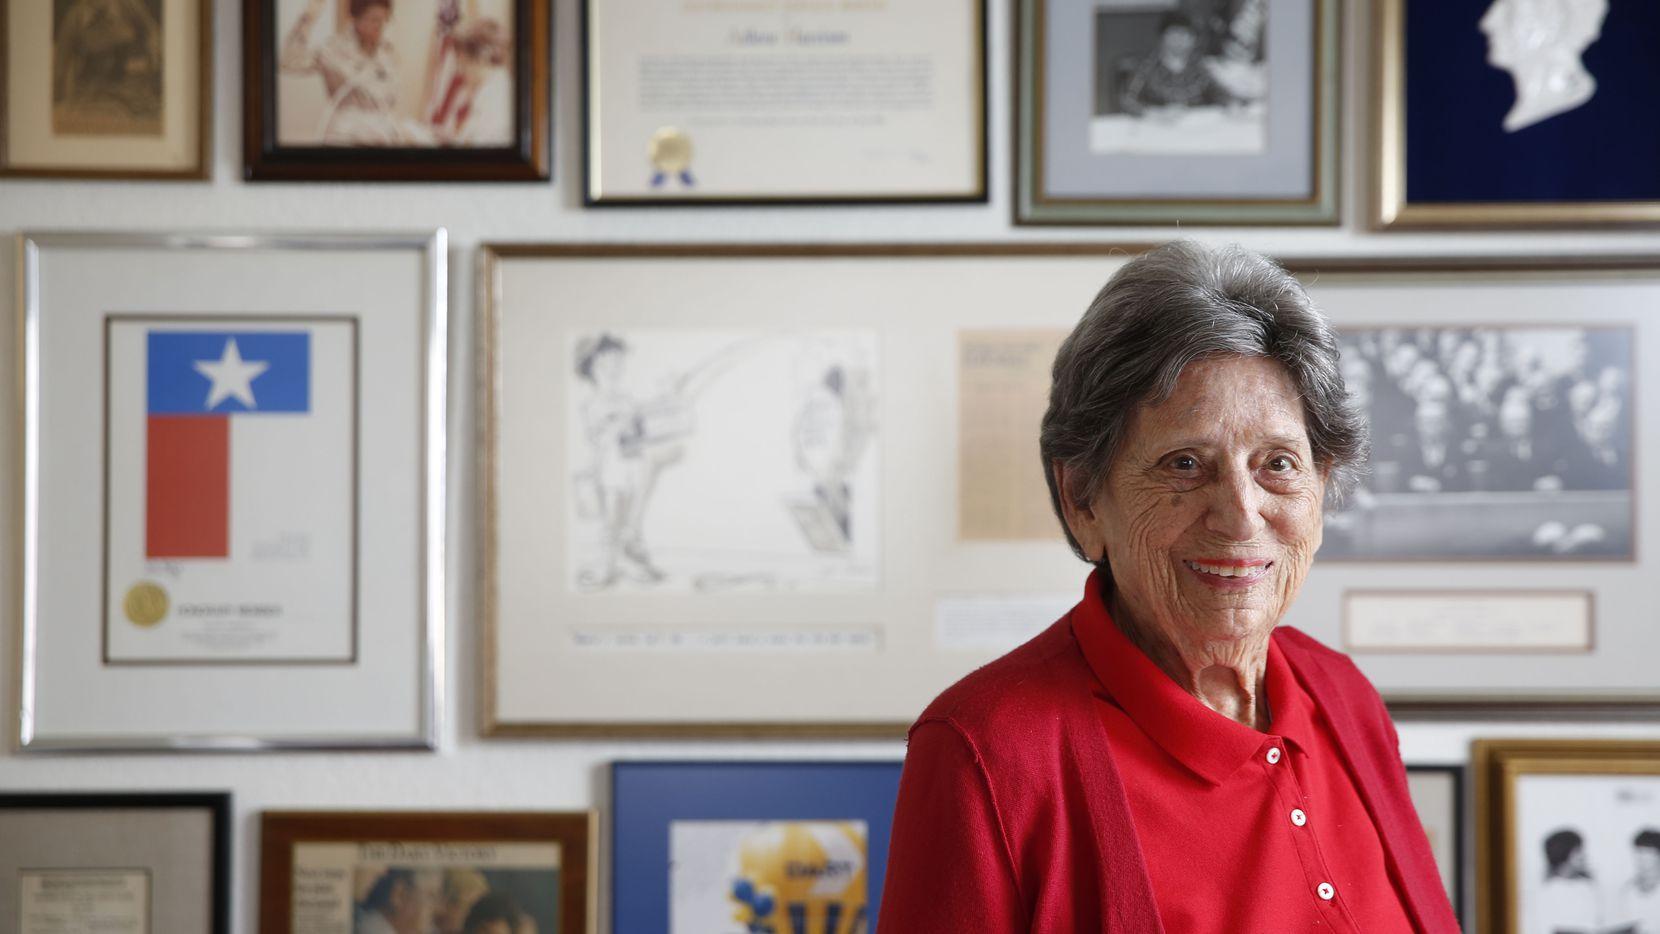 Adlene Harrison, Dallas' first female mayor, at her home in Dallas.